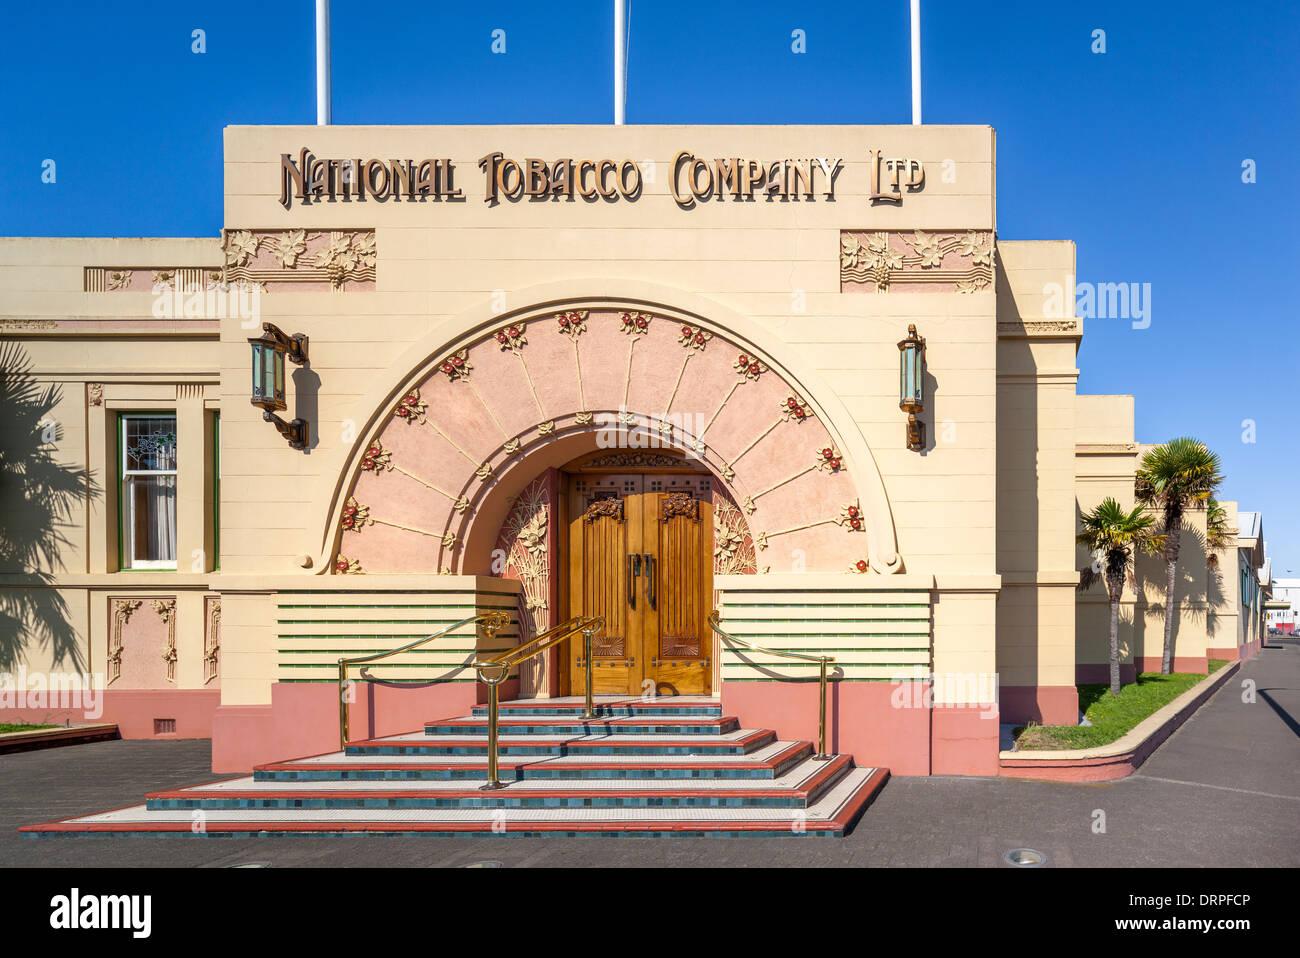 https://c7.alamy.com/comp/DRPFCP/napier-art-deco-famous-national-tobacco-company-building-formerly-DRPFCP.jpg